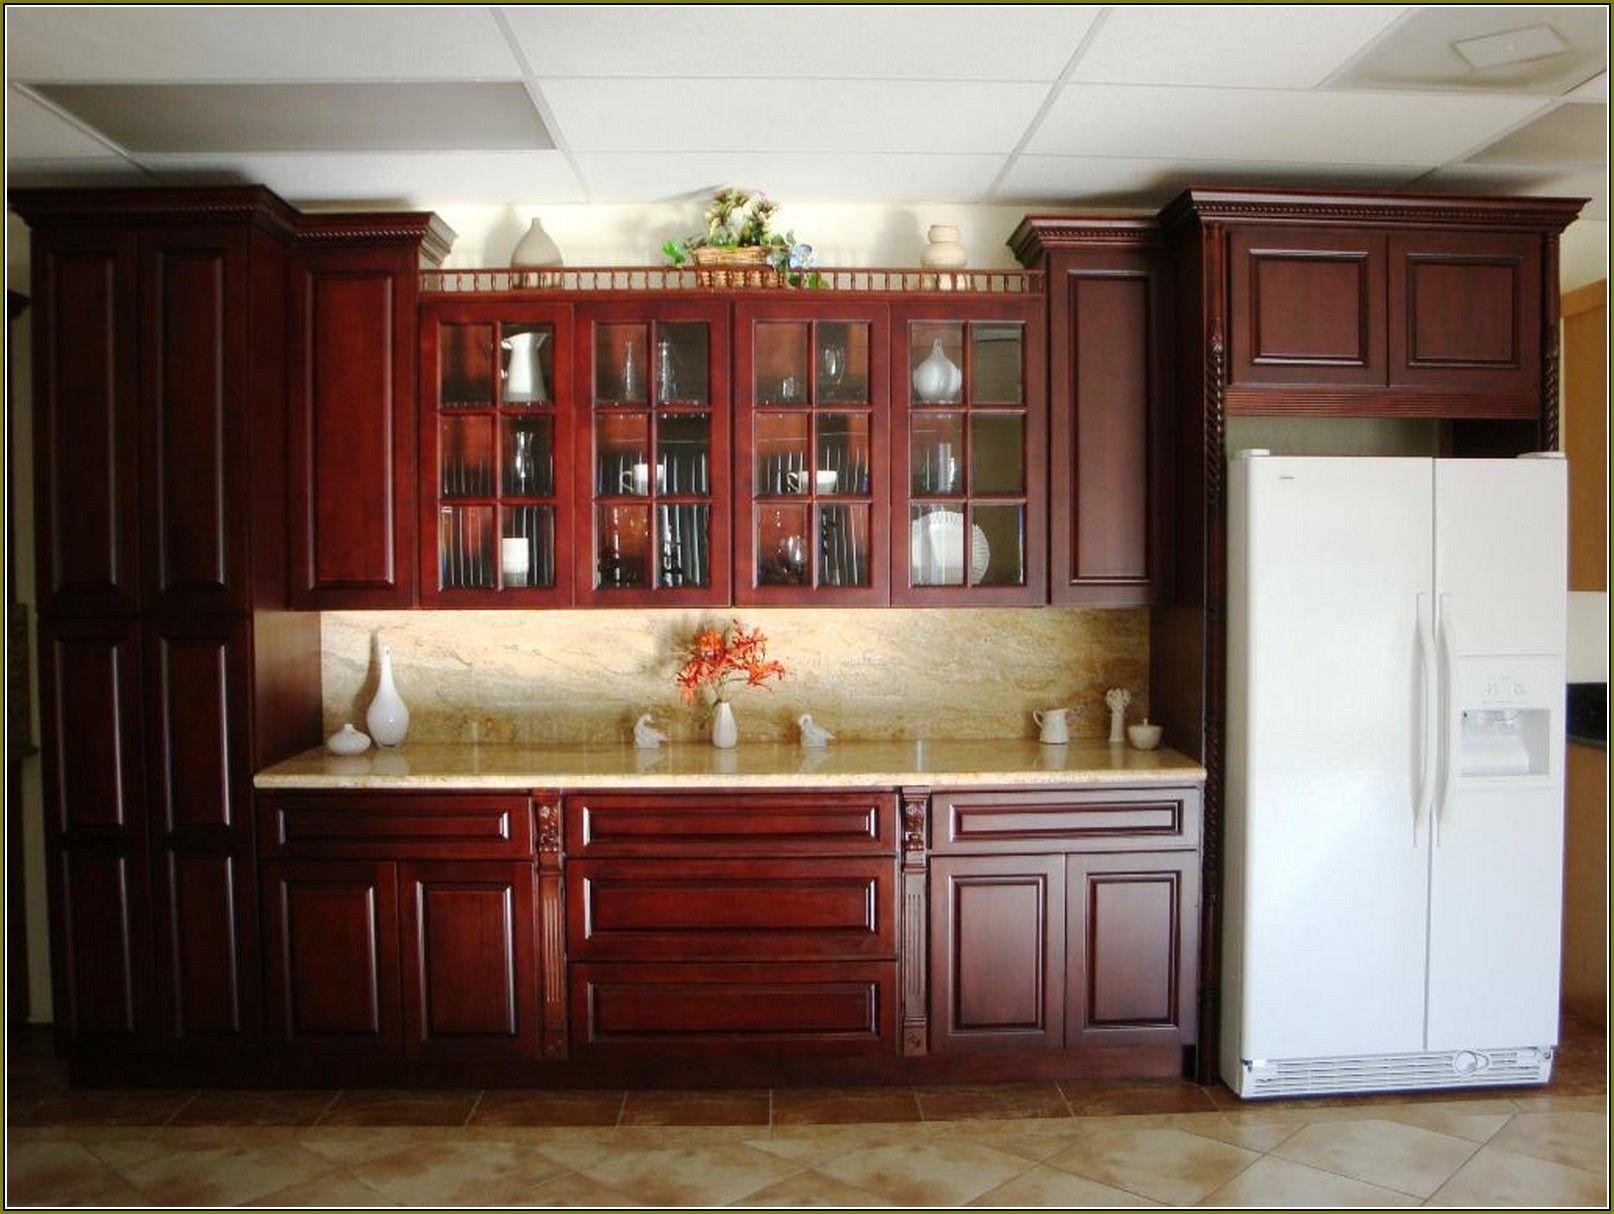 77 Replacement Cabinet Doors Lowes Kitchen Nook Lighting Ideas